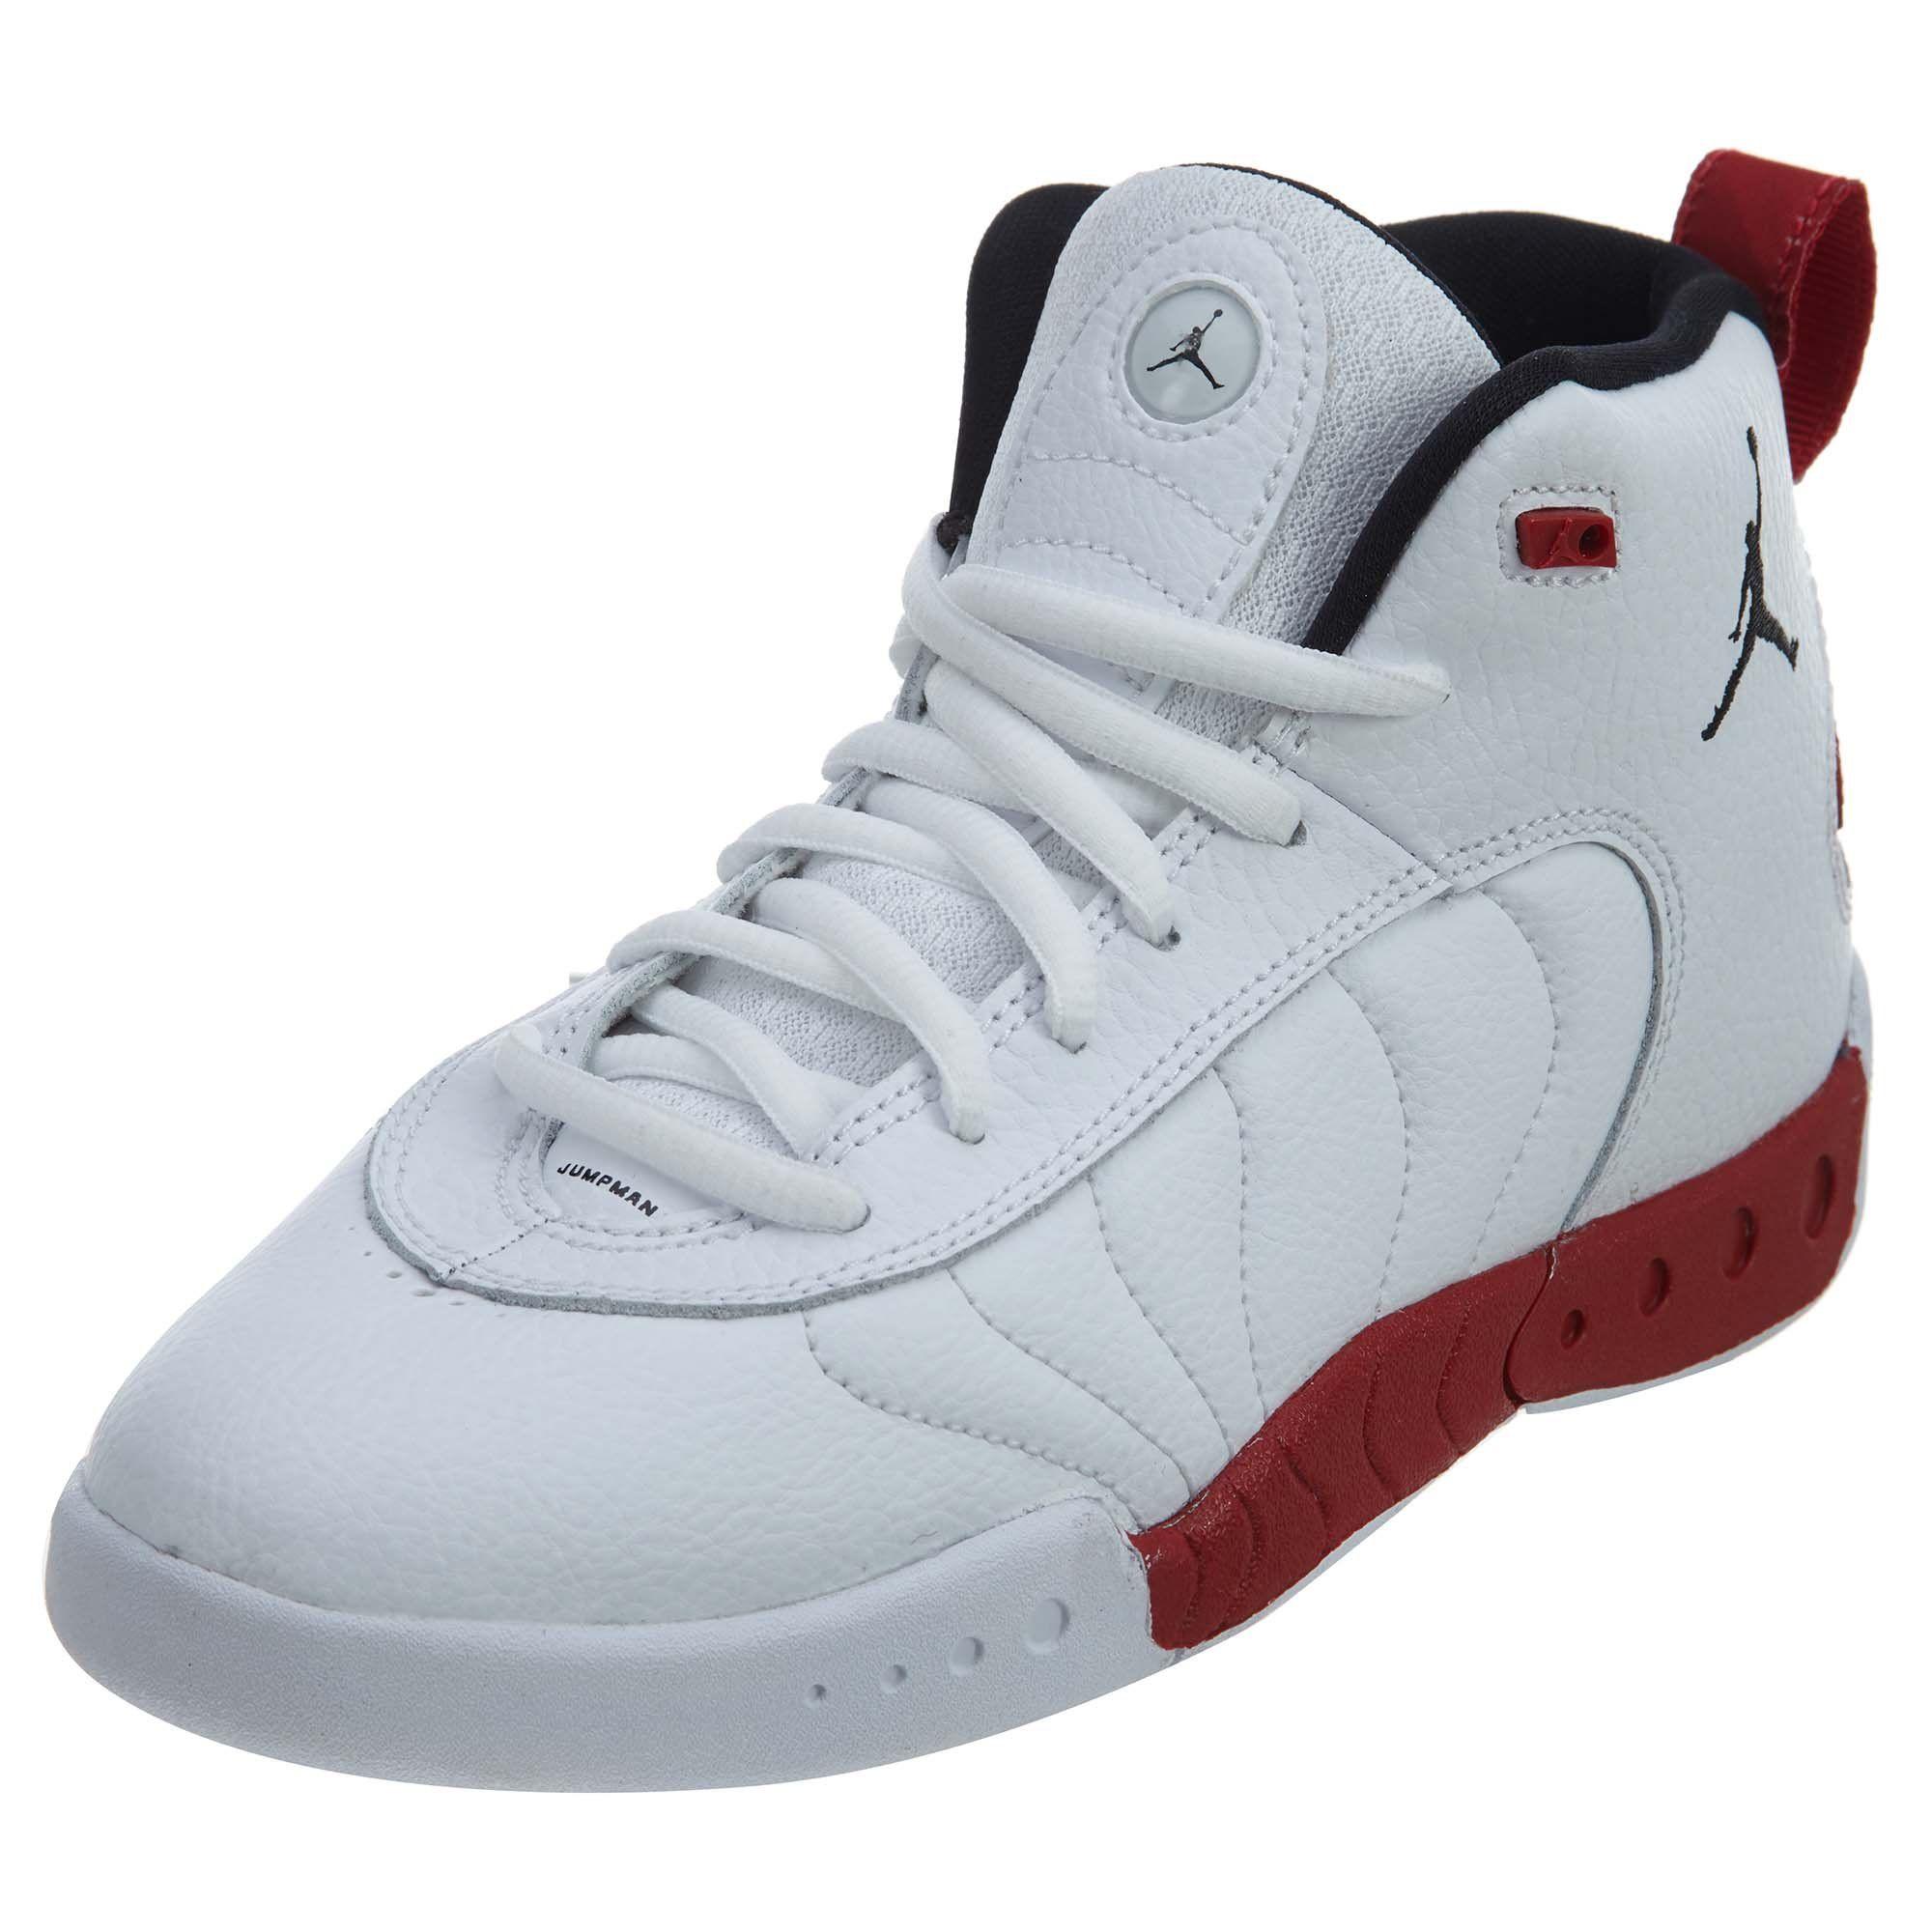 e845ab234d57 Jordan Jumpman Pro Little Kids Style  909419-120 Size  10.5 Y US ...